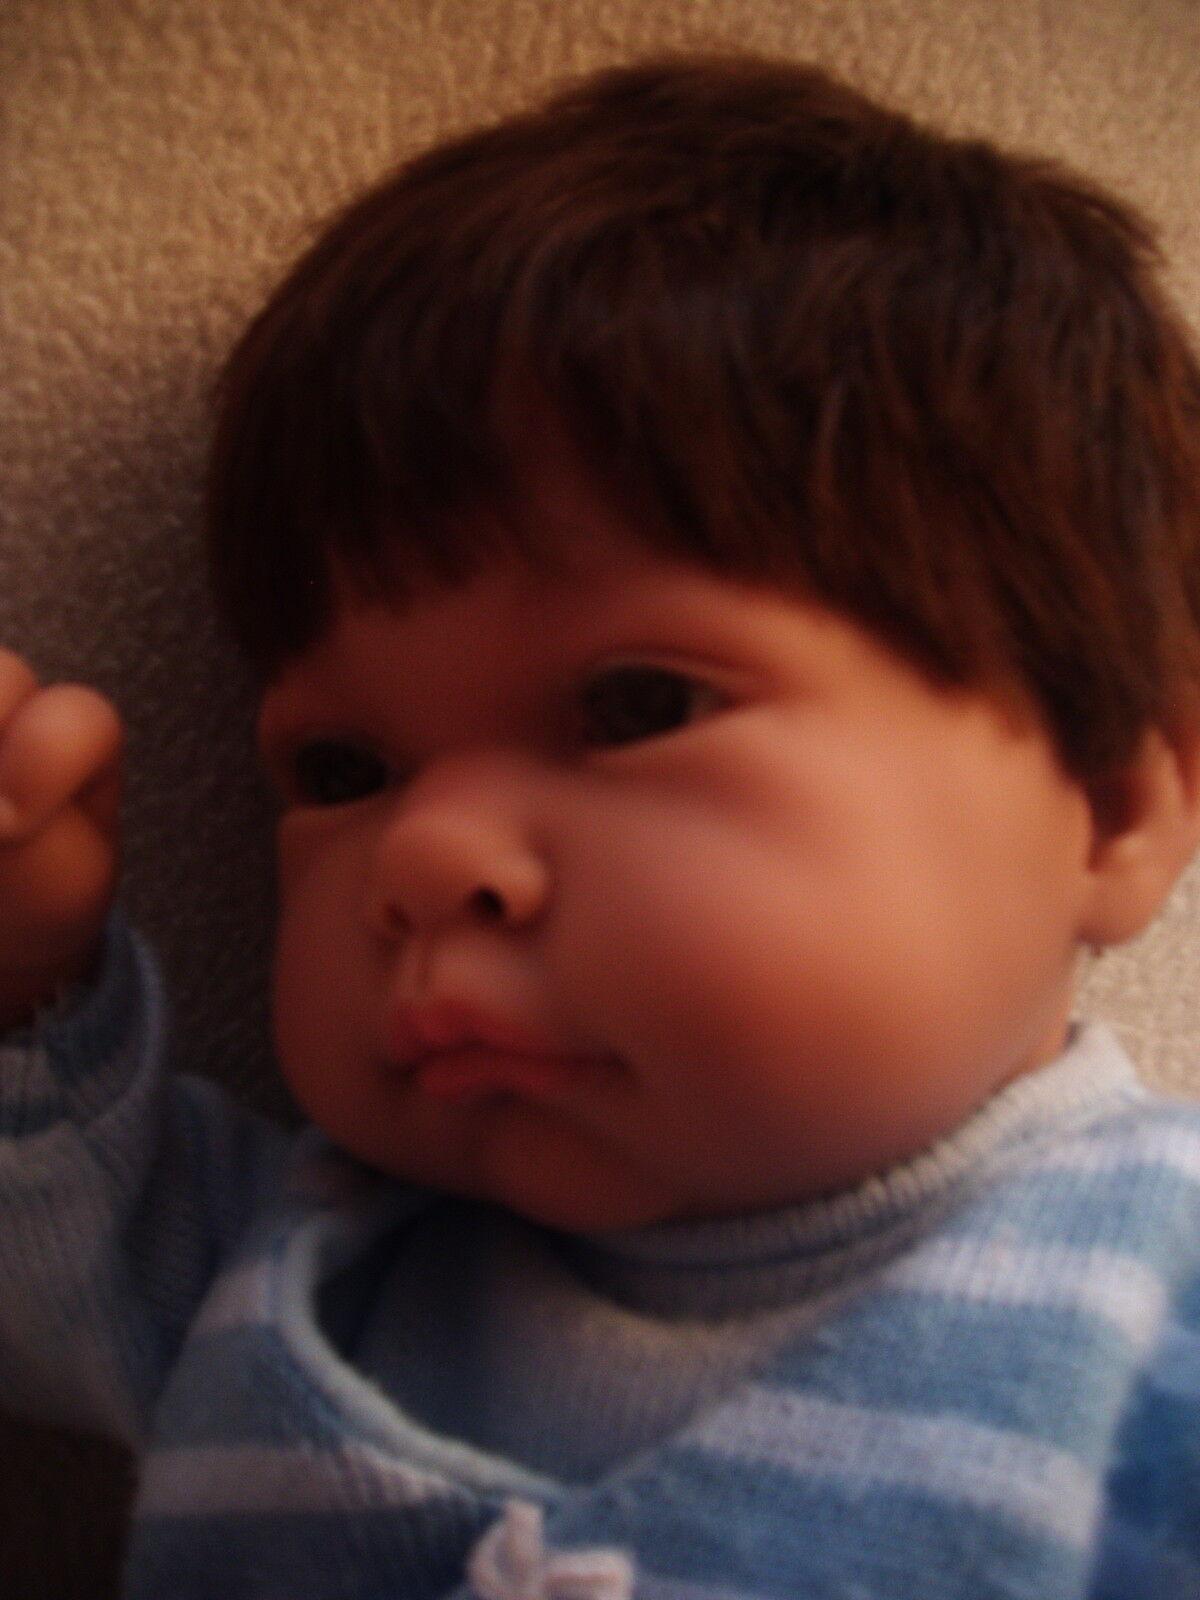 Reborn Rebornbaby  Rebornpuppe  Puppe Puppe Puppe  Antonio Juan Babypuppe Puppenbaby dfa3b6